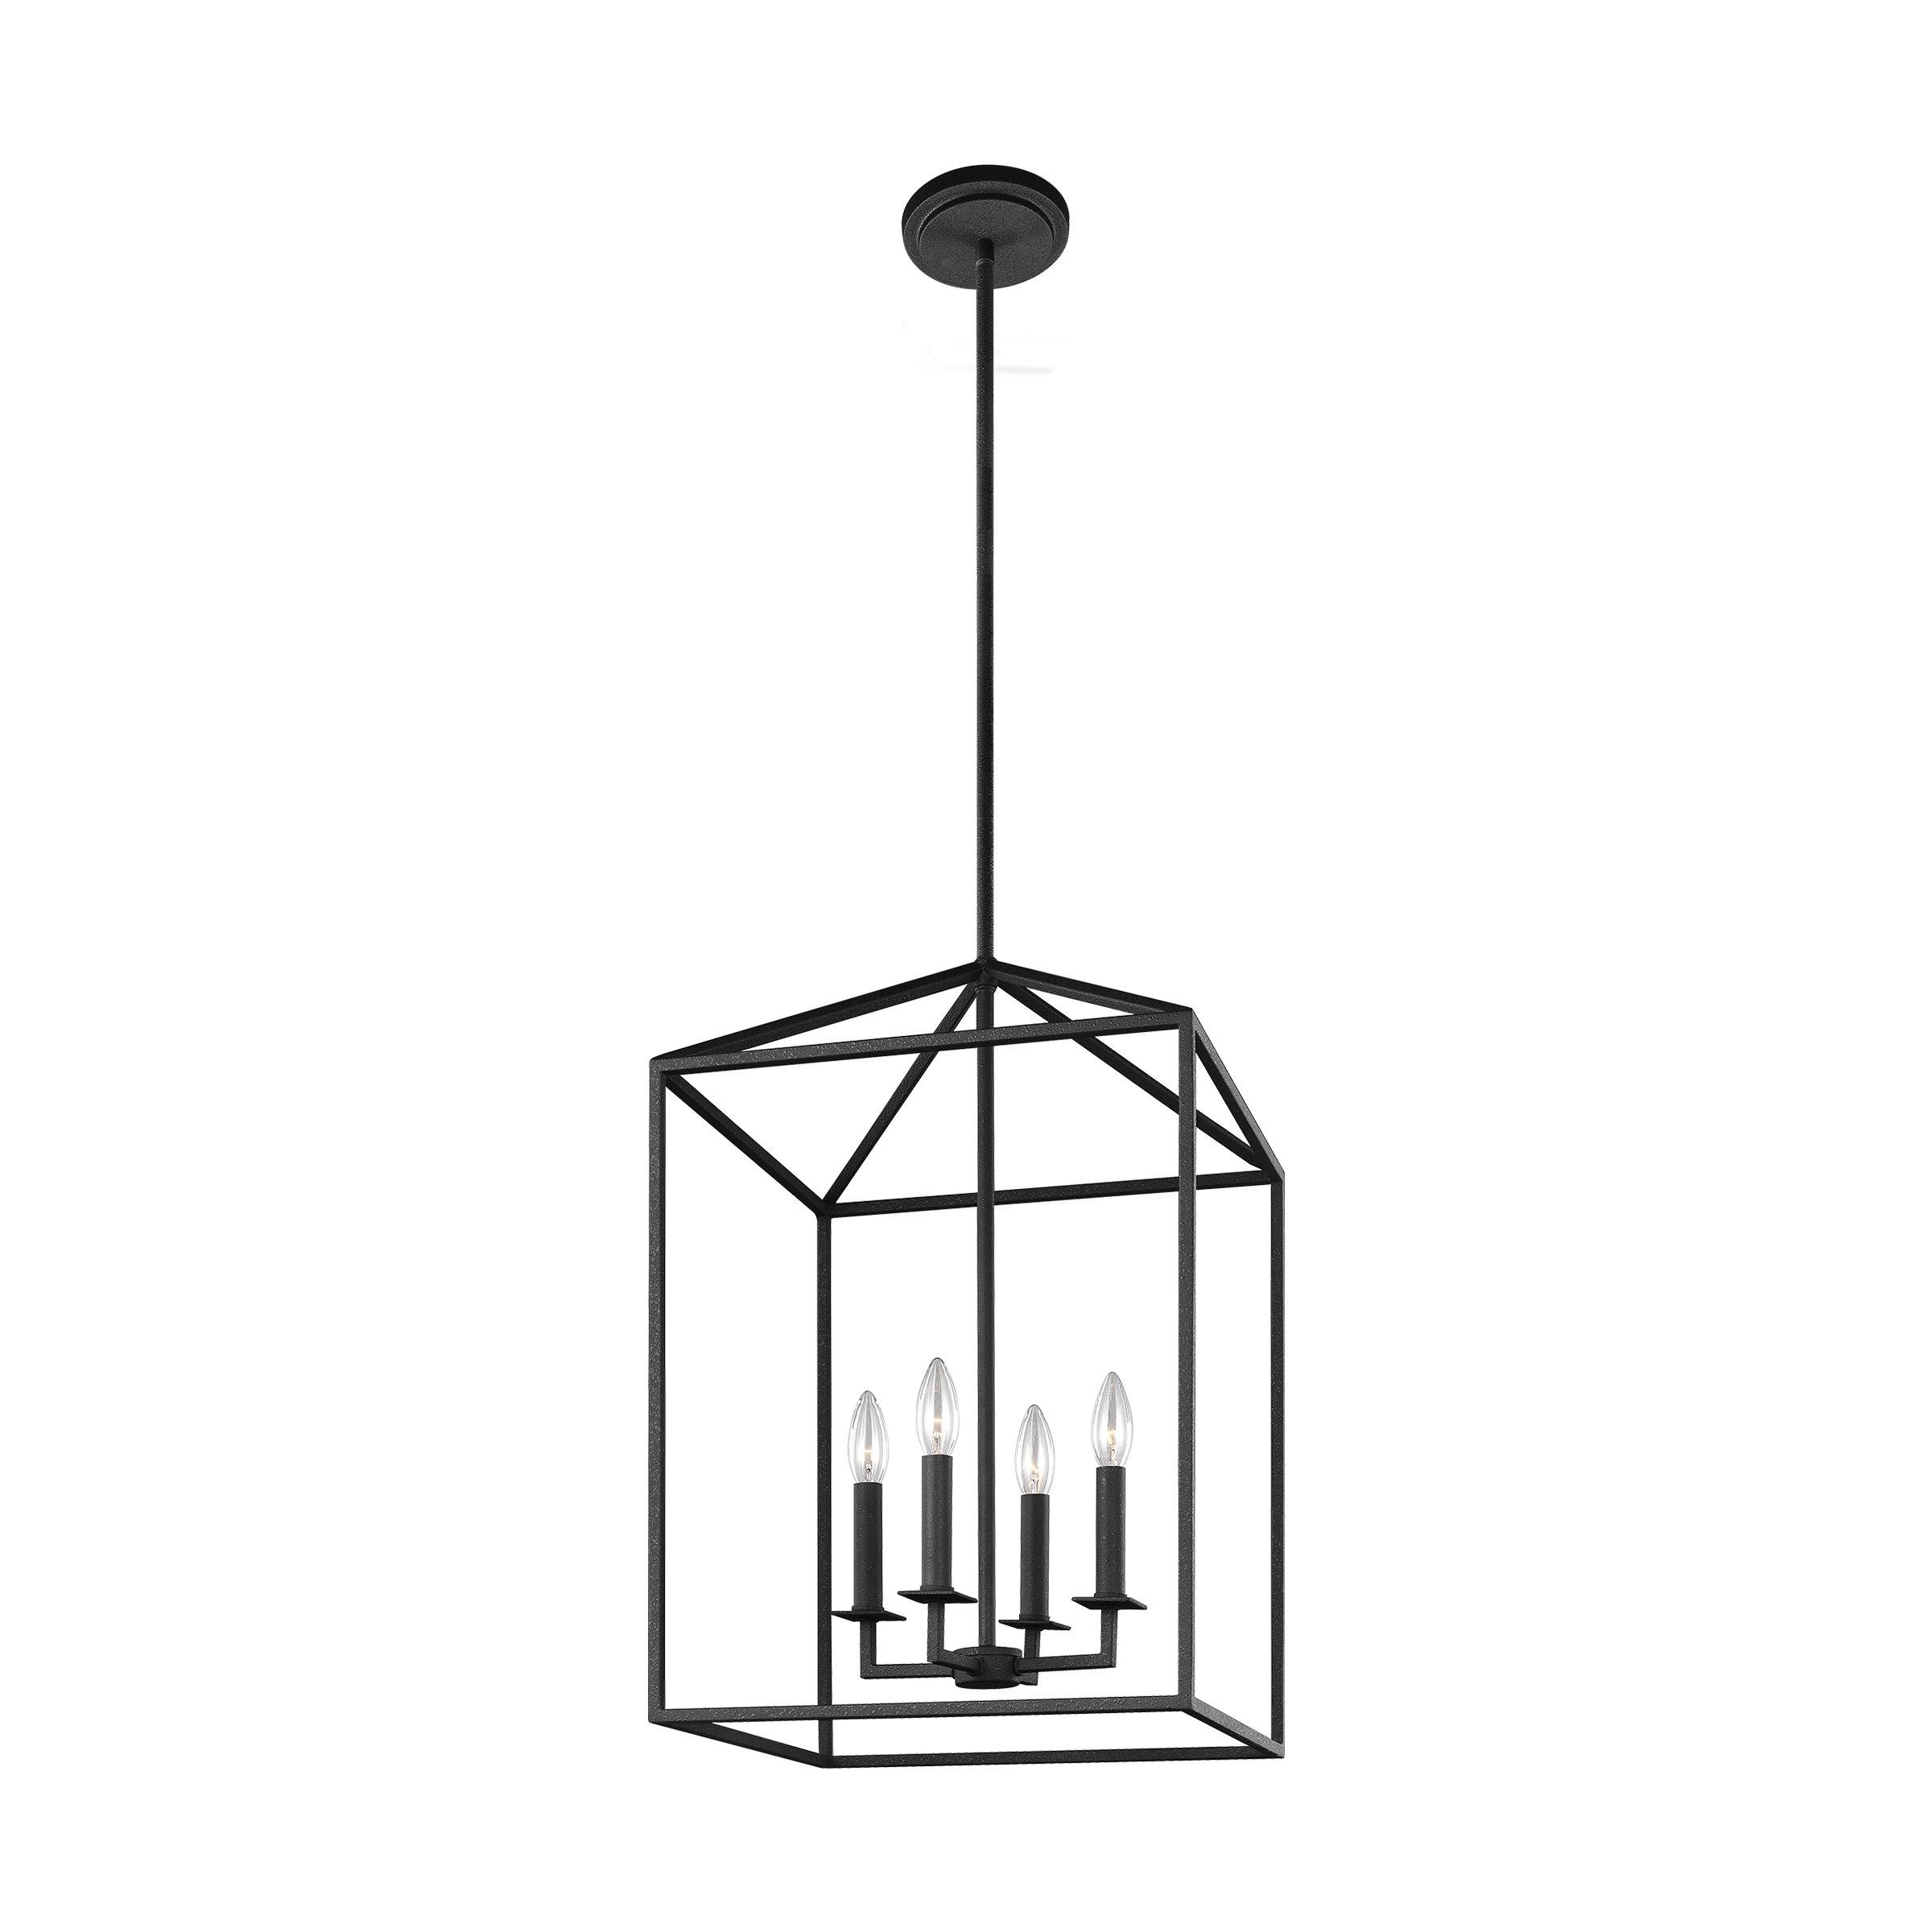 Odie 8 Light Lantern Square / Rectangle Pendants Pertaining To Favorite Odie 4 Light Lantern Square/rectangle Pendant (Gallery 2 of 20)